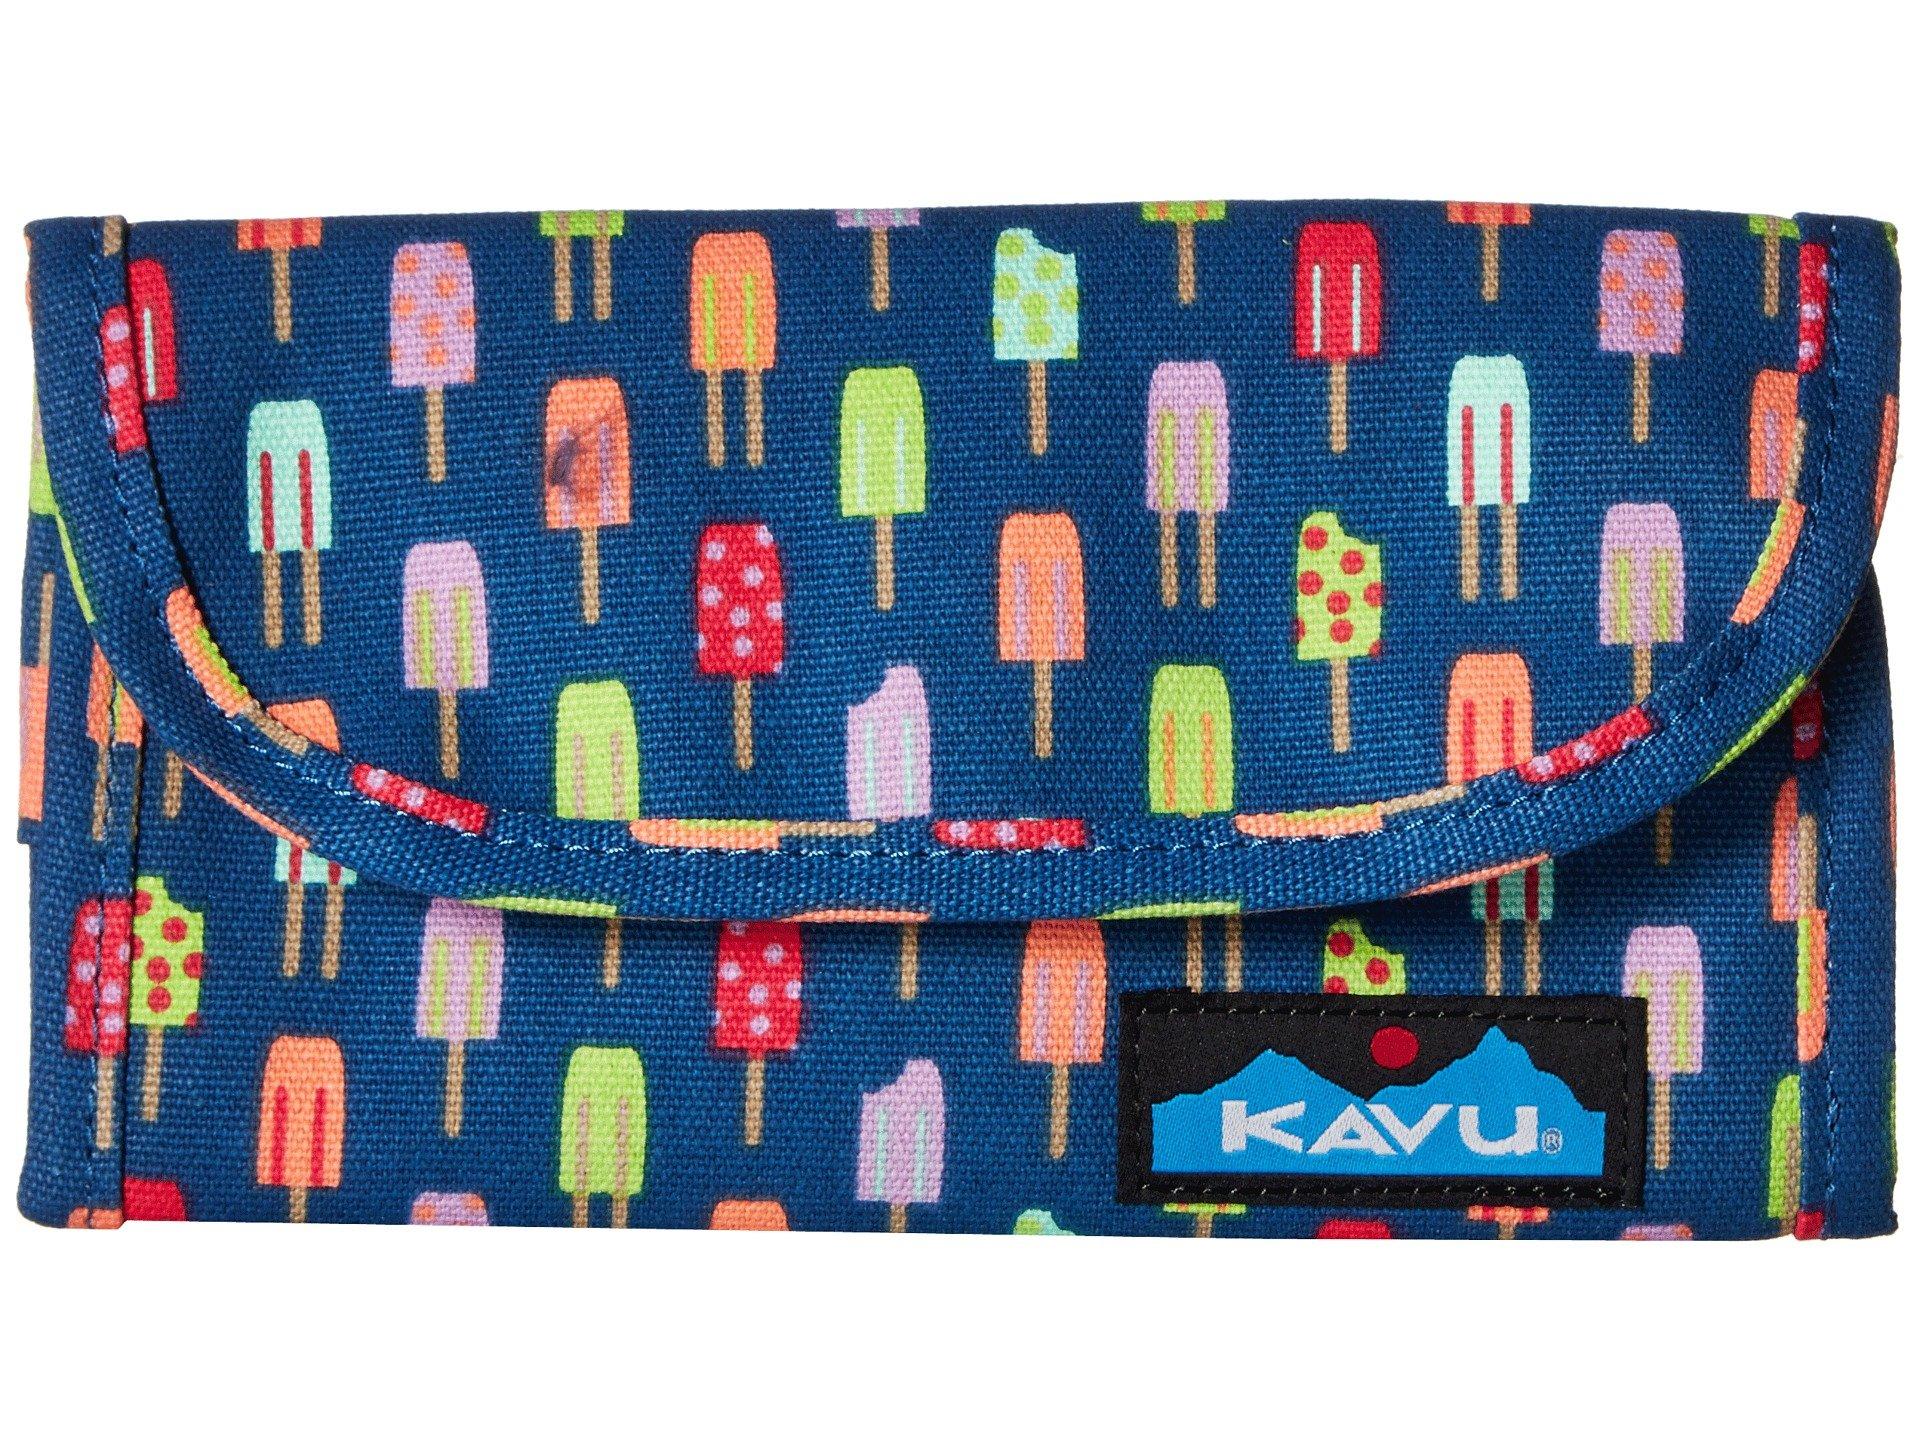 Kavu Spender Kavu Big Popsicle Party Big 54zFUFq